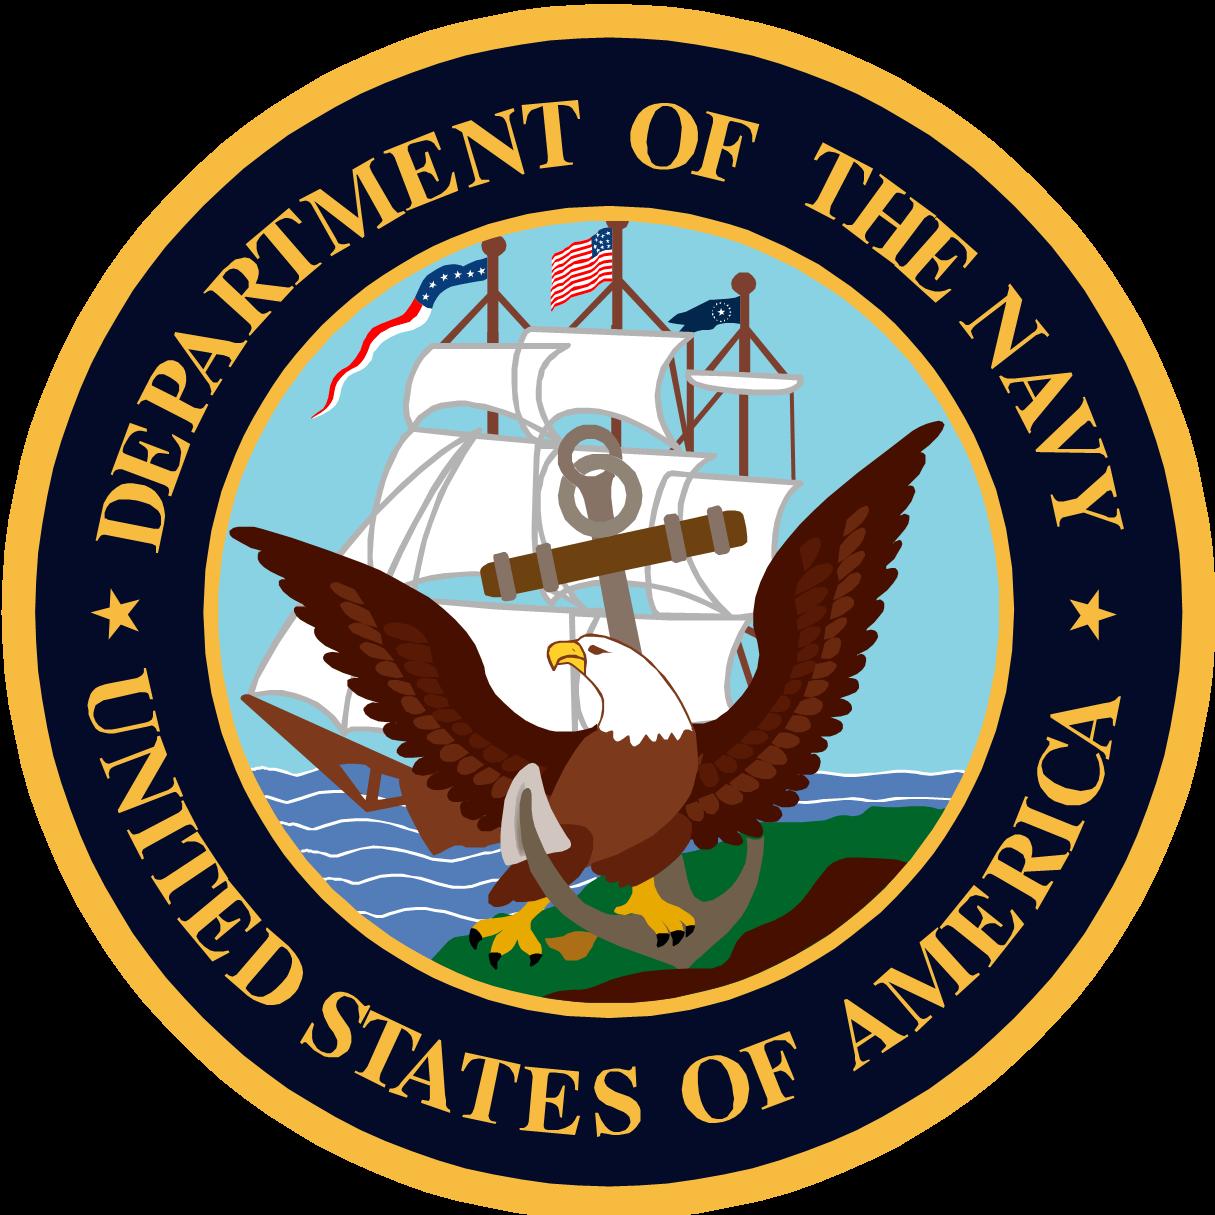 us navy logo - photo #9